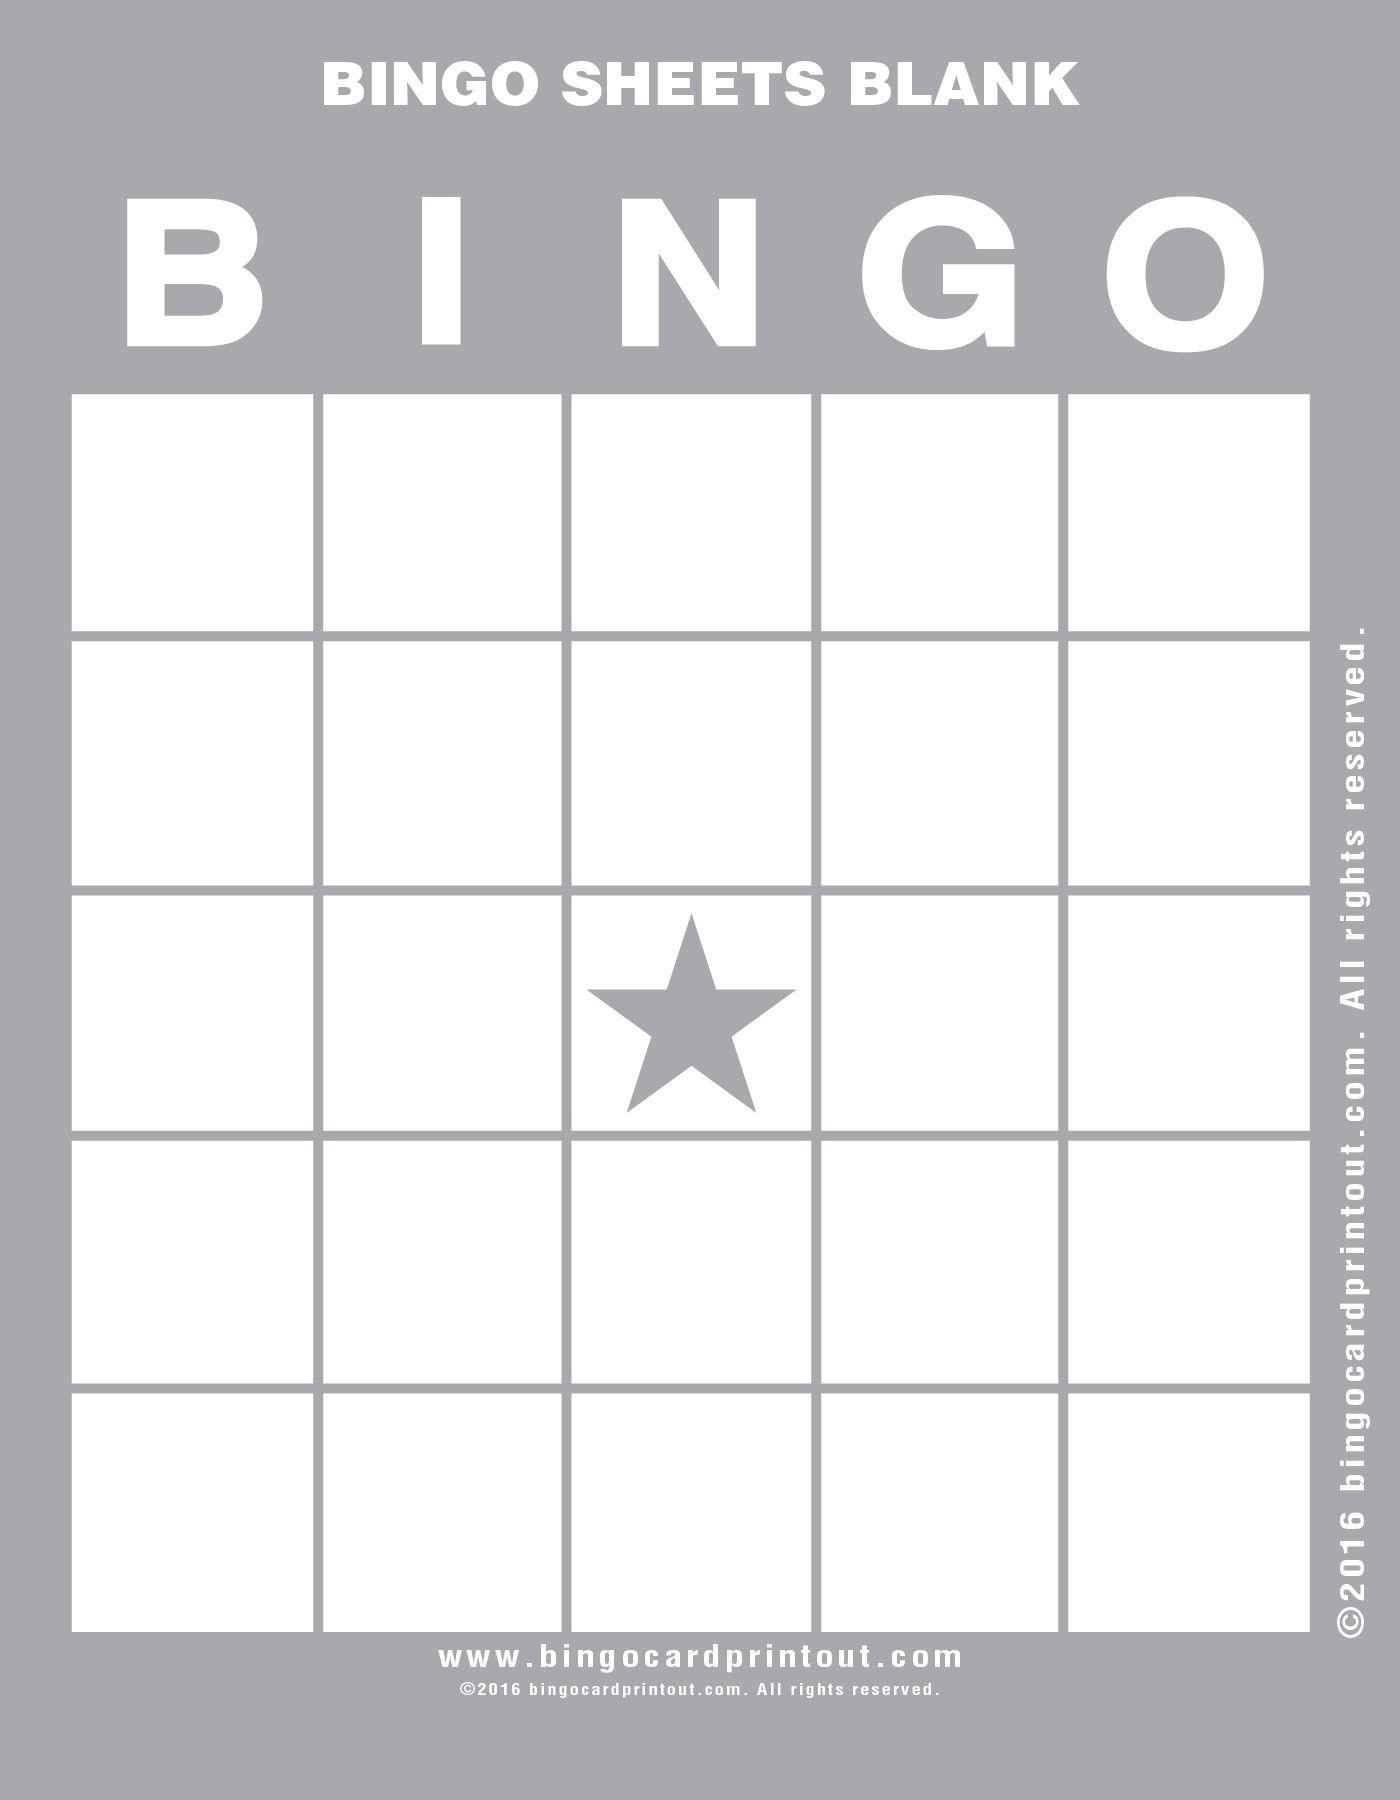 Bingo Sheets Blank 9 | Bingo Sheets, Bingo Cards, Bingo Template